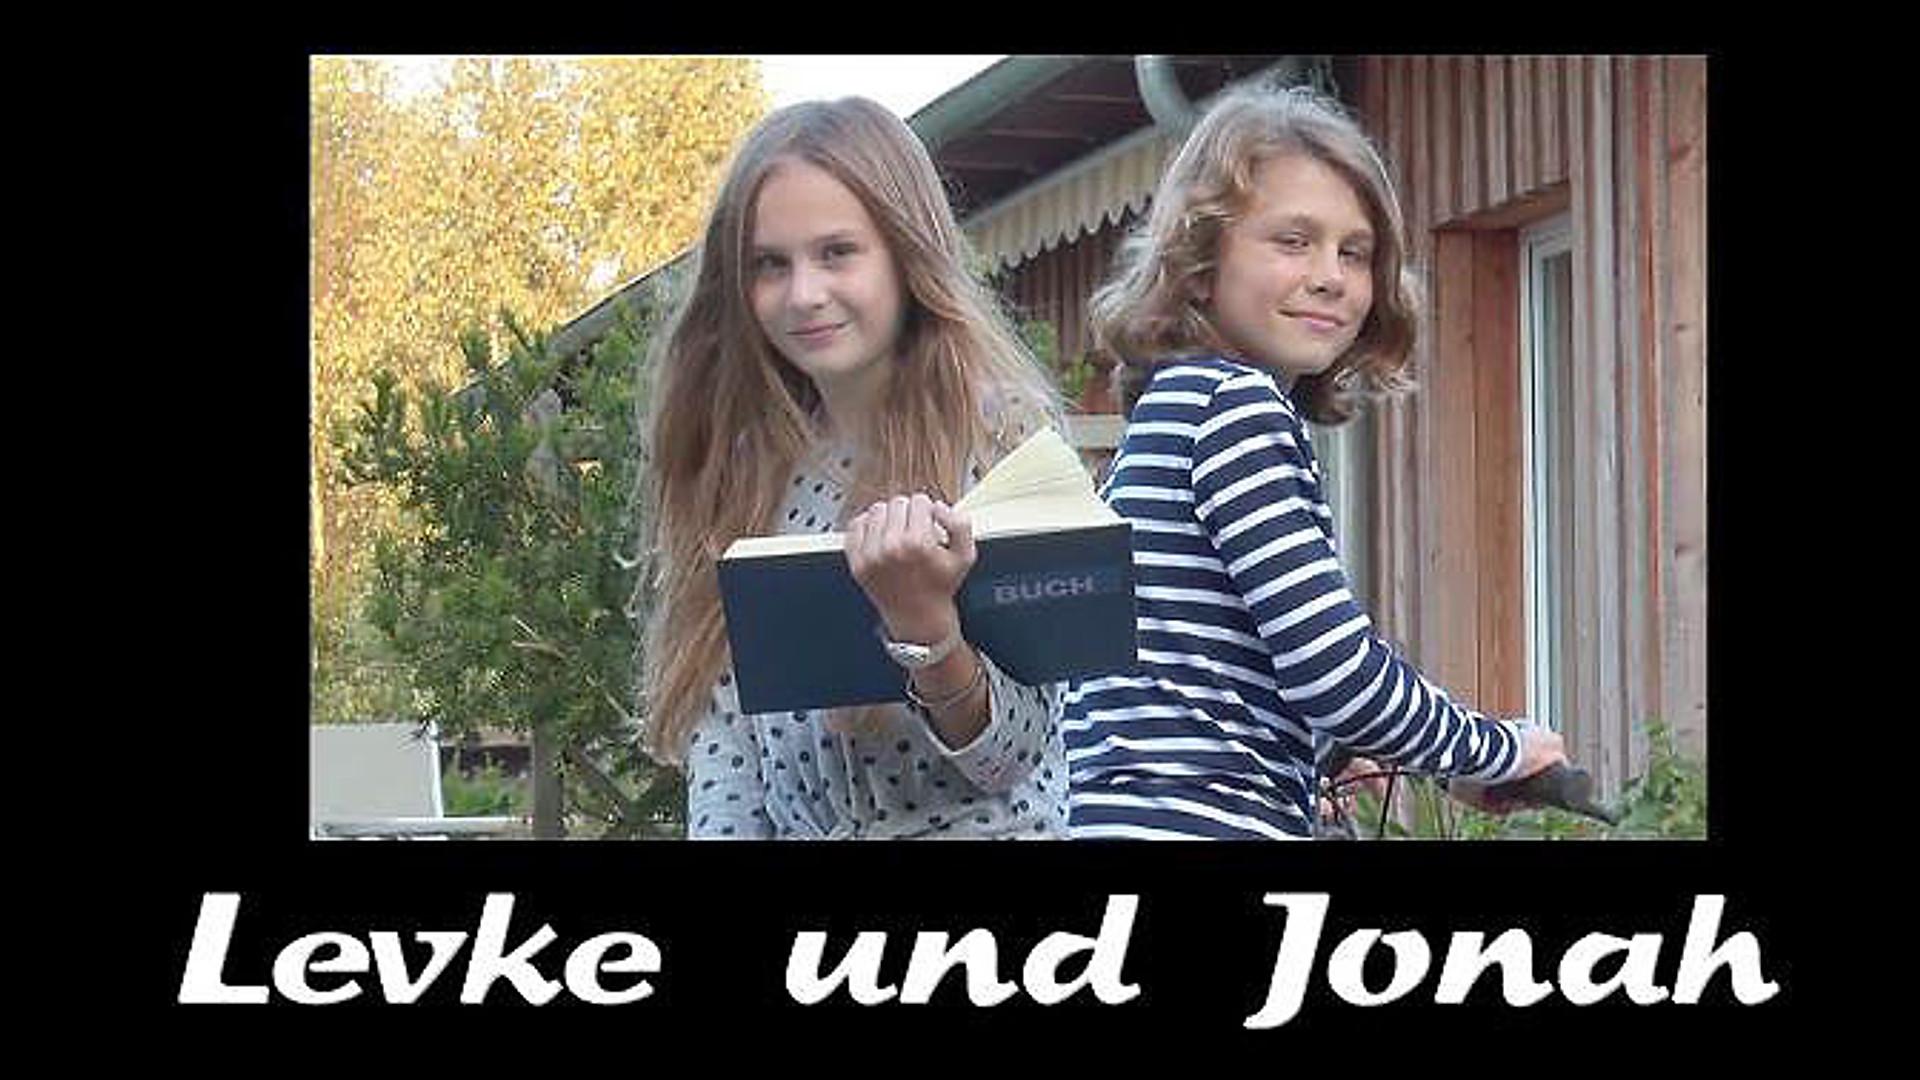 Levke und Jonah vimeo hd.mp4